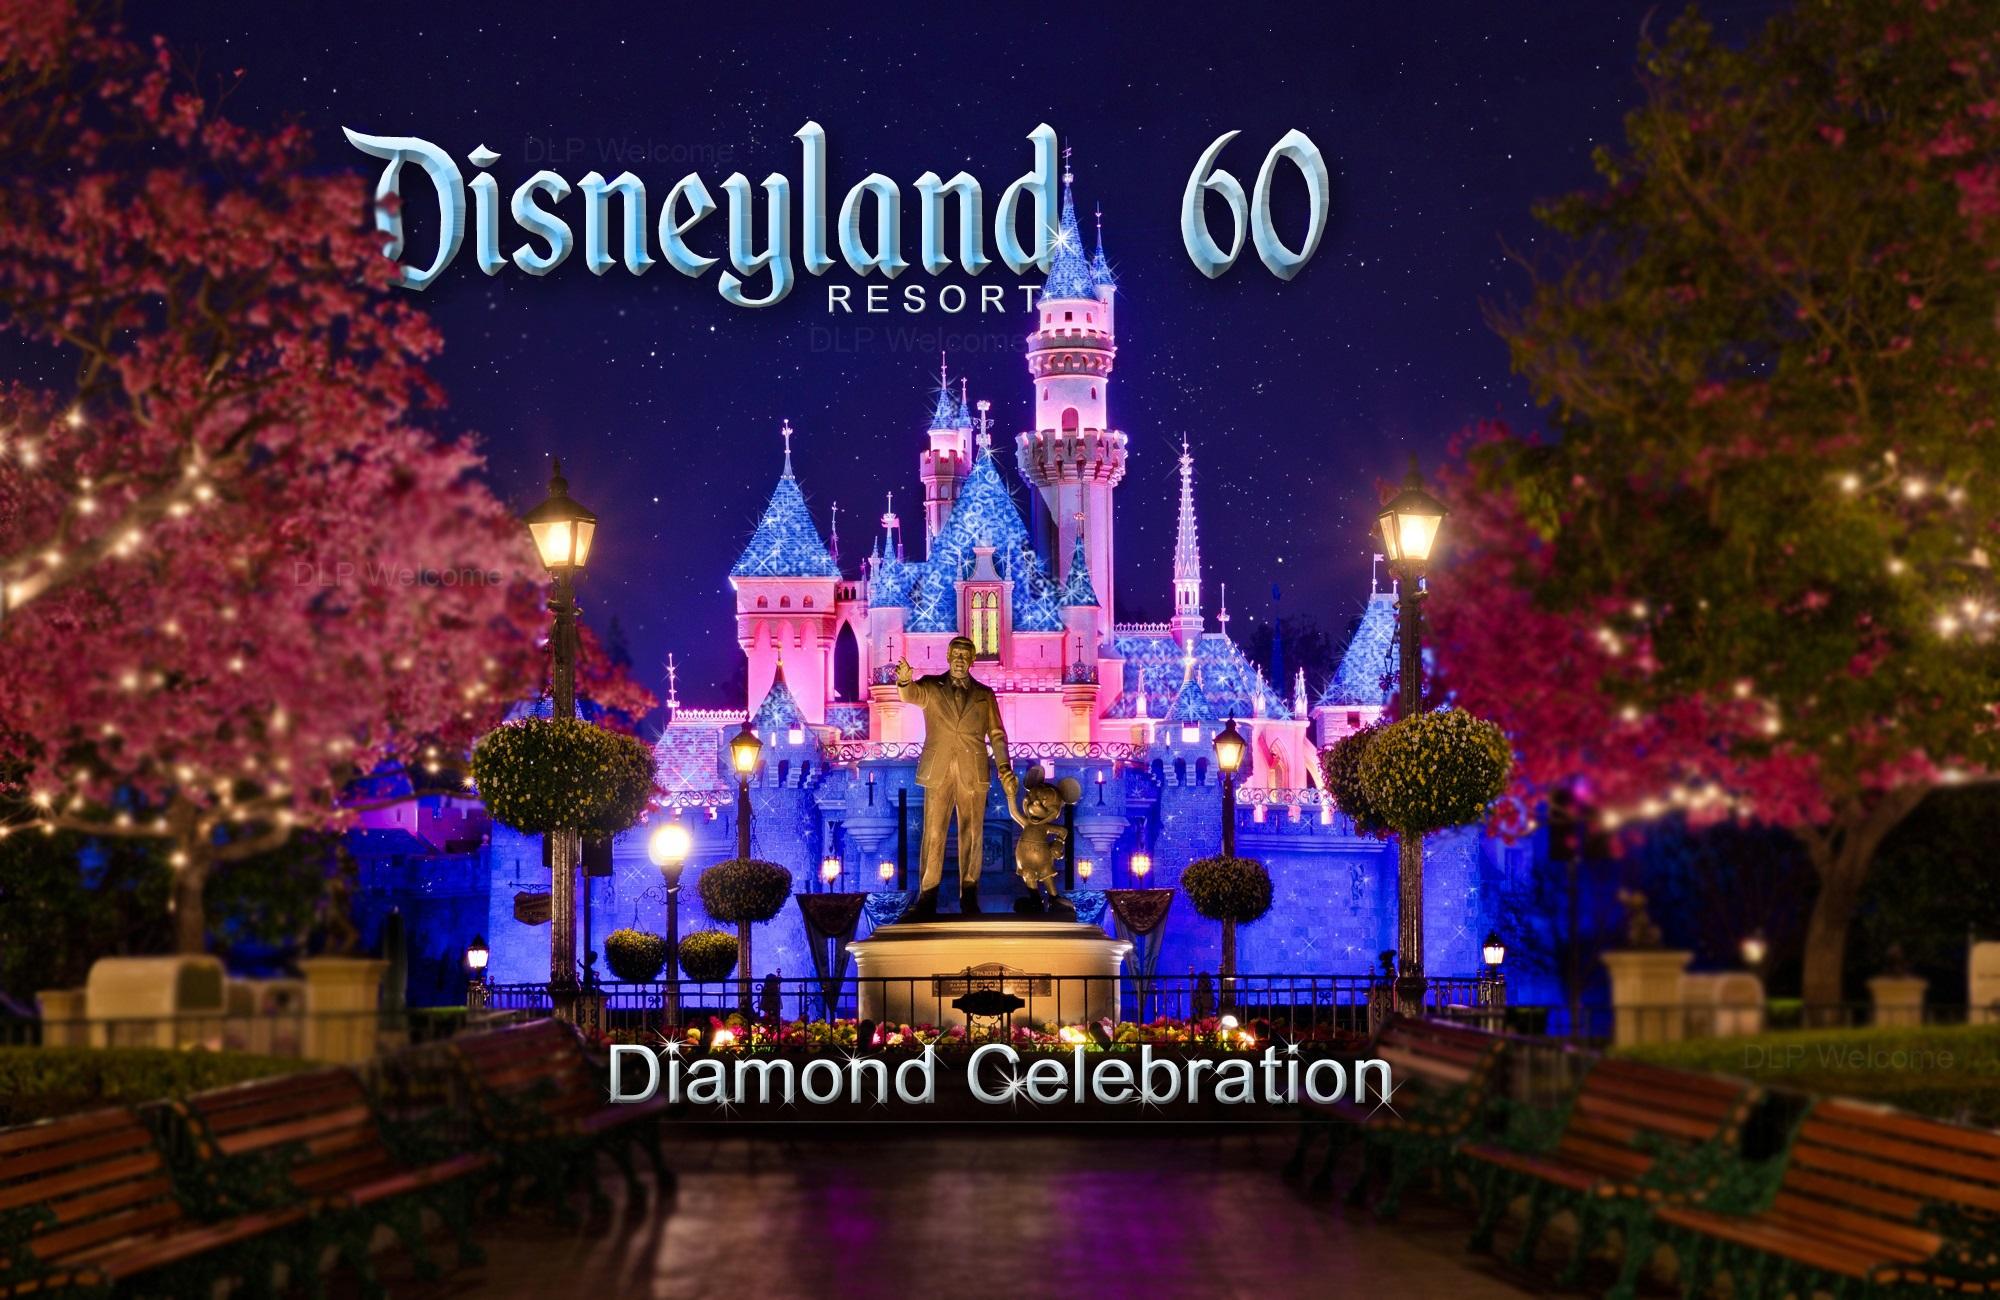 [Disneyland Resort] 60ème anniversaire, Diamond Celebration - Page 2 Montage-6